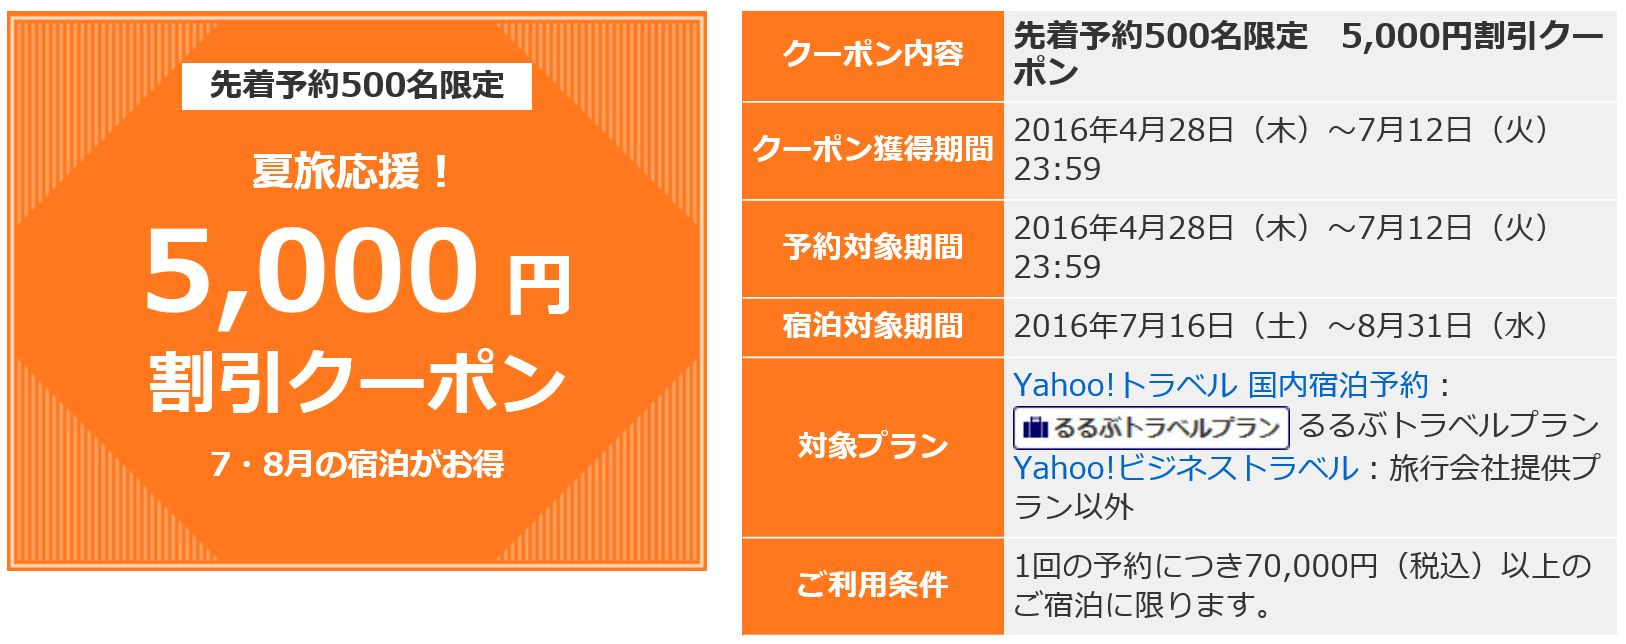 Yahoo!トラベル 割引クーポン